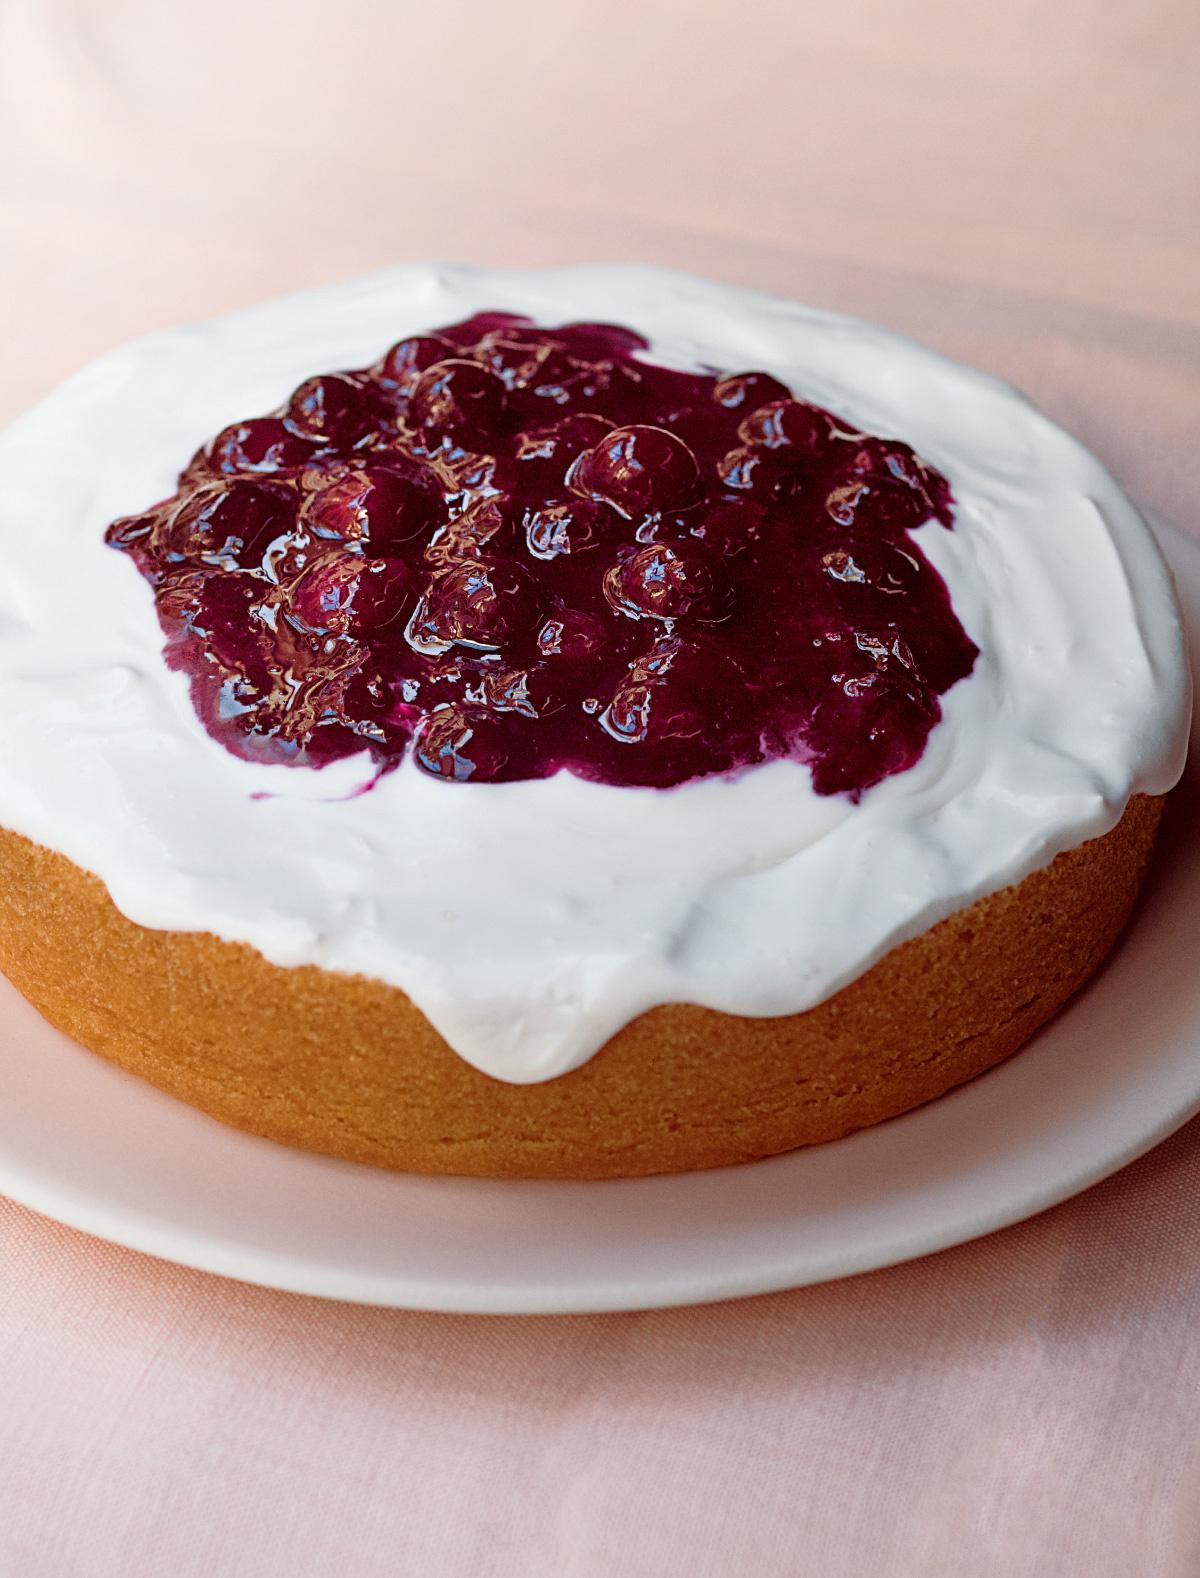 Lemon Tender Cake With Blueberry Compote Vegan